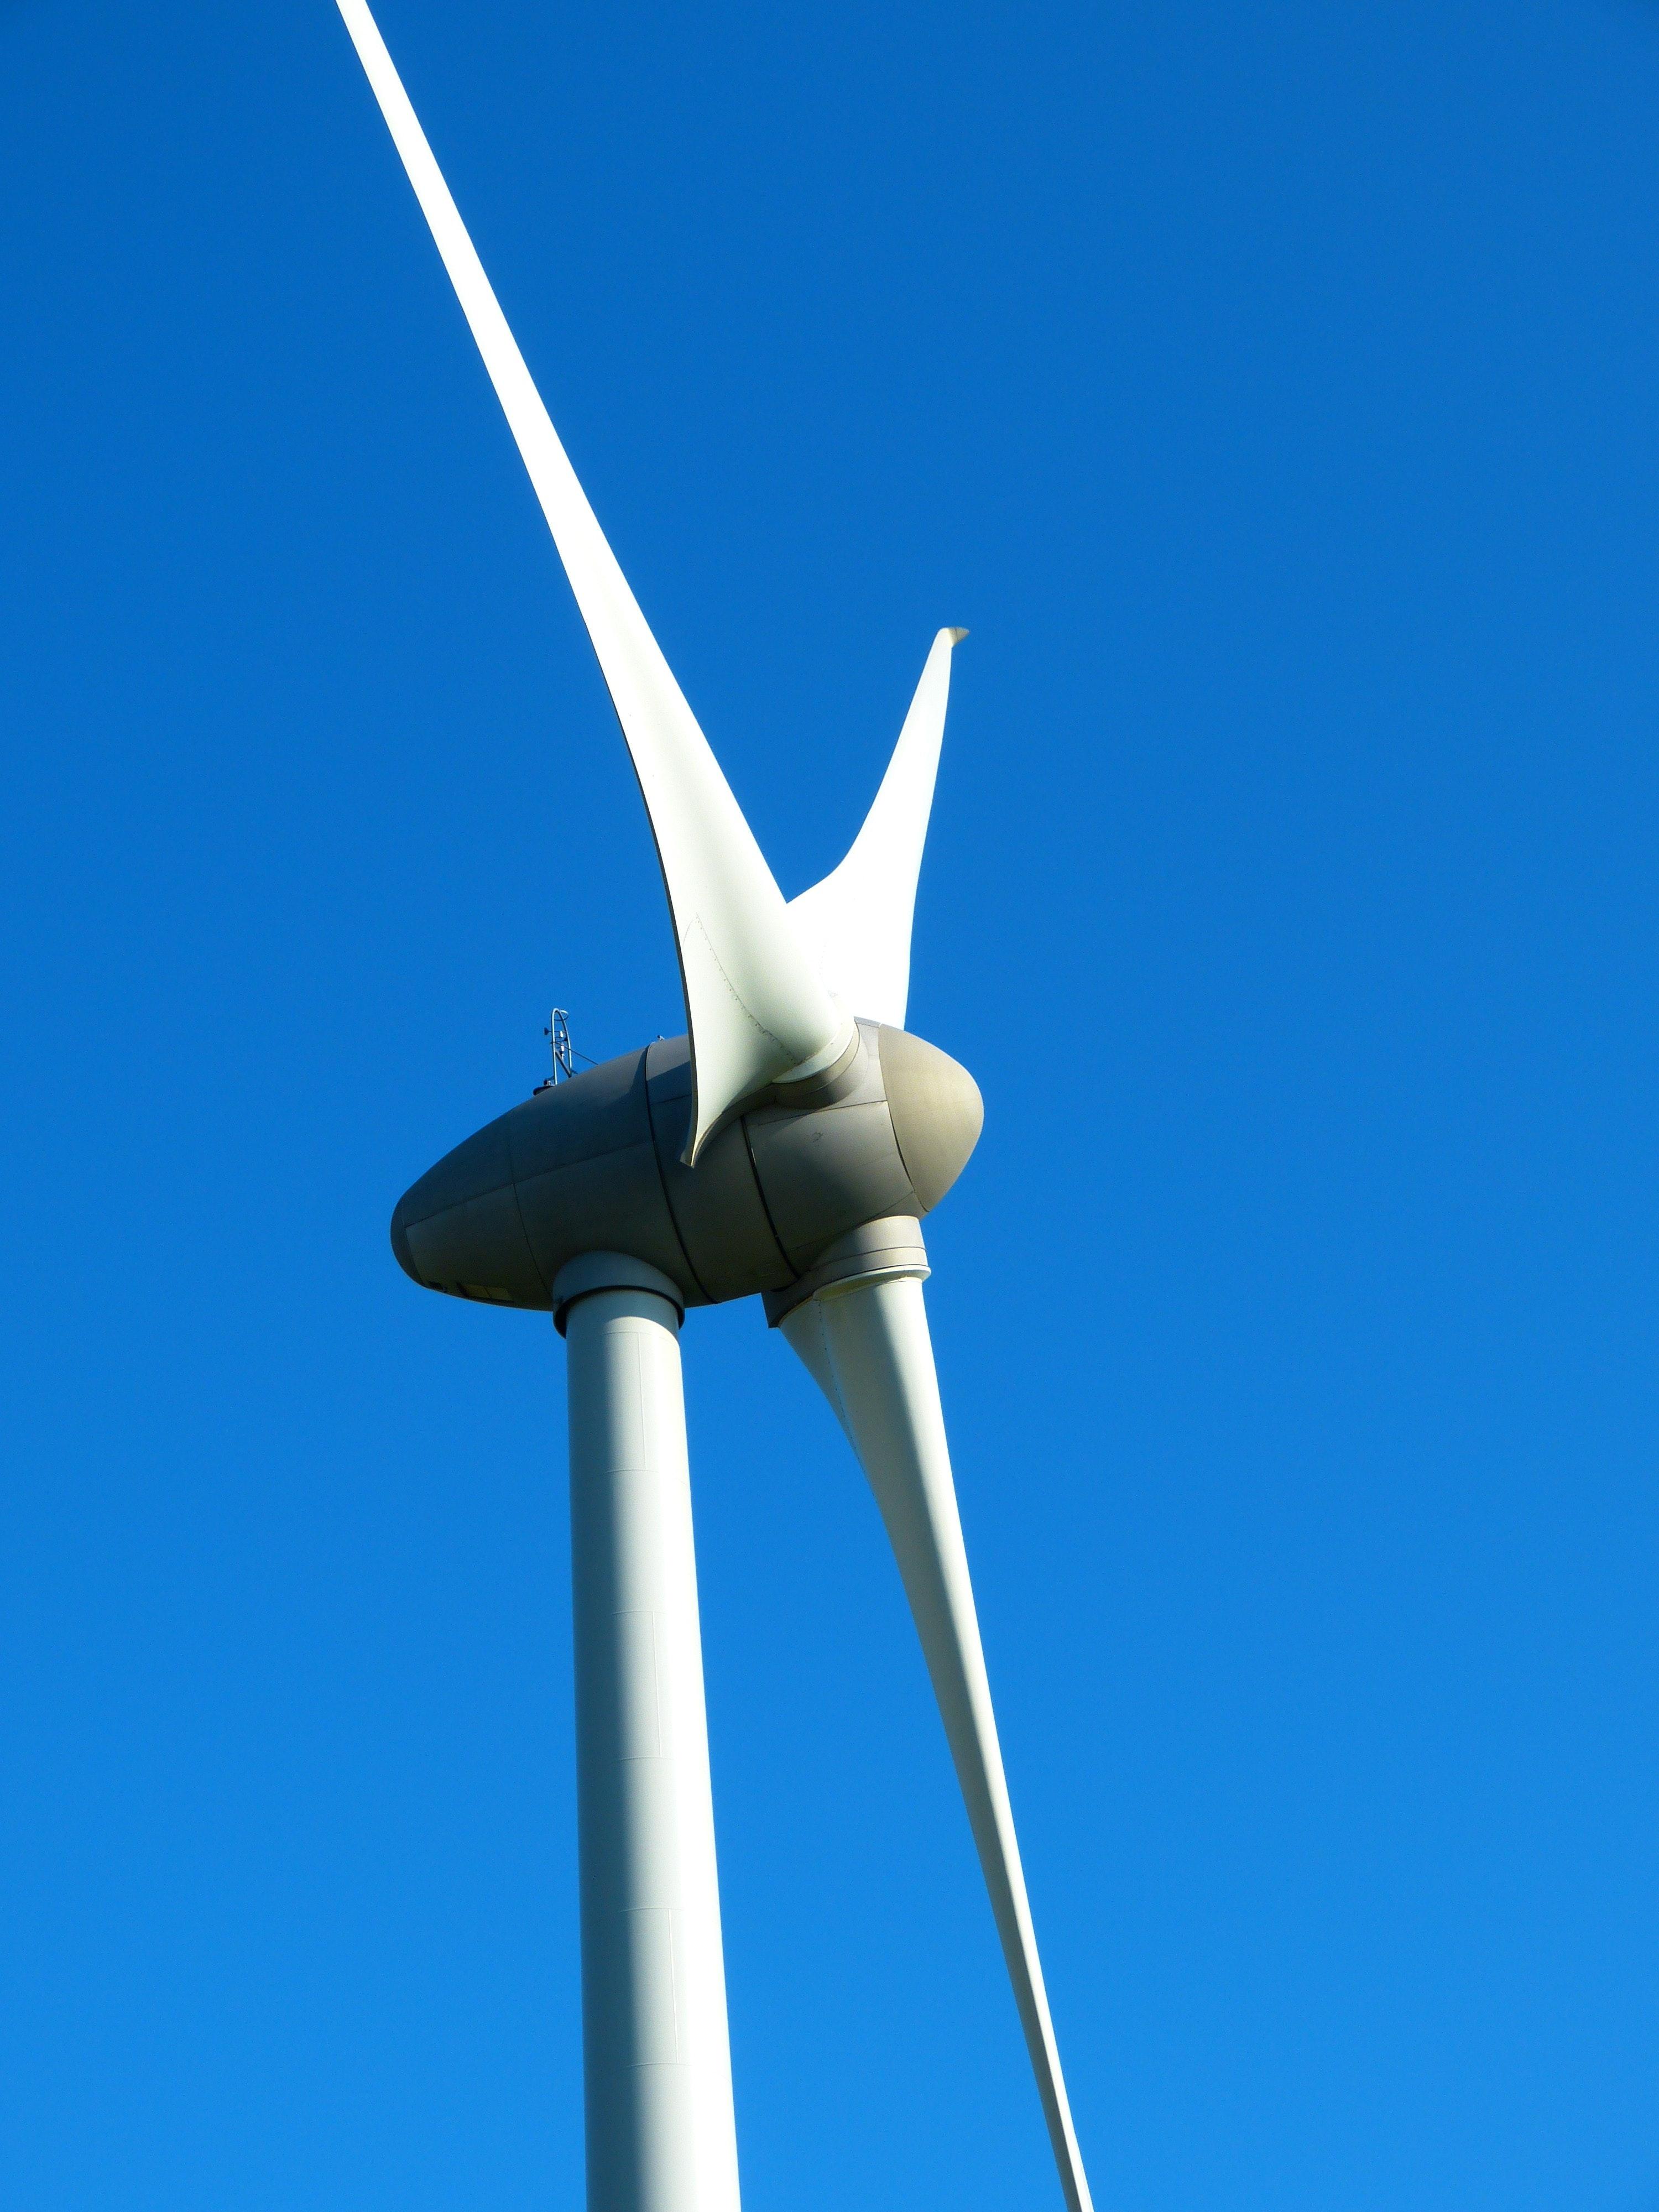 250 Engaging Wind Turbine Photos 183 Pexels 183 Free Stock Photos